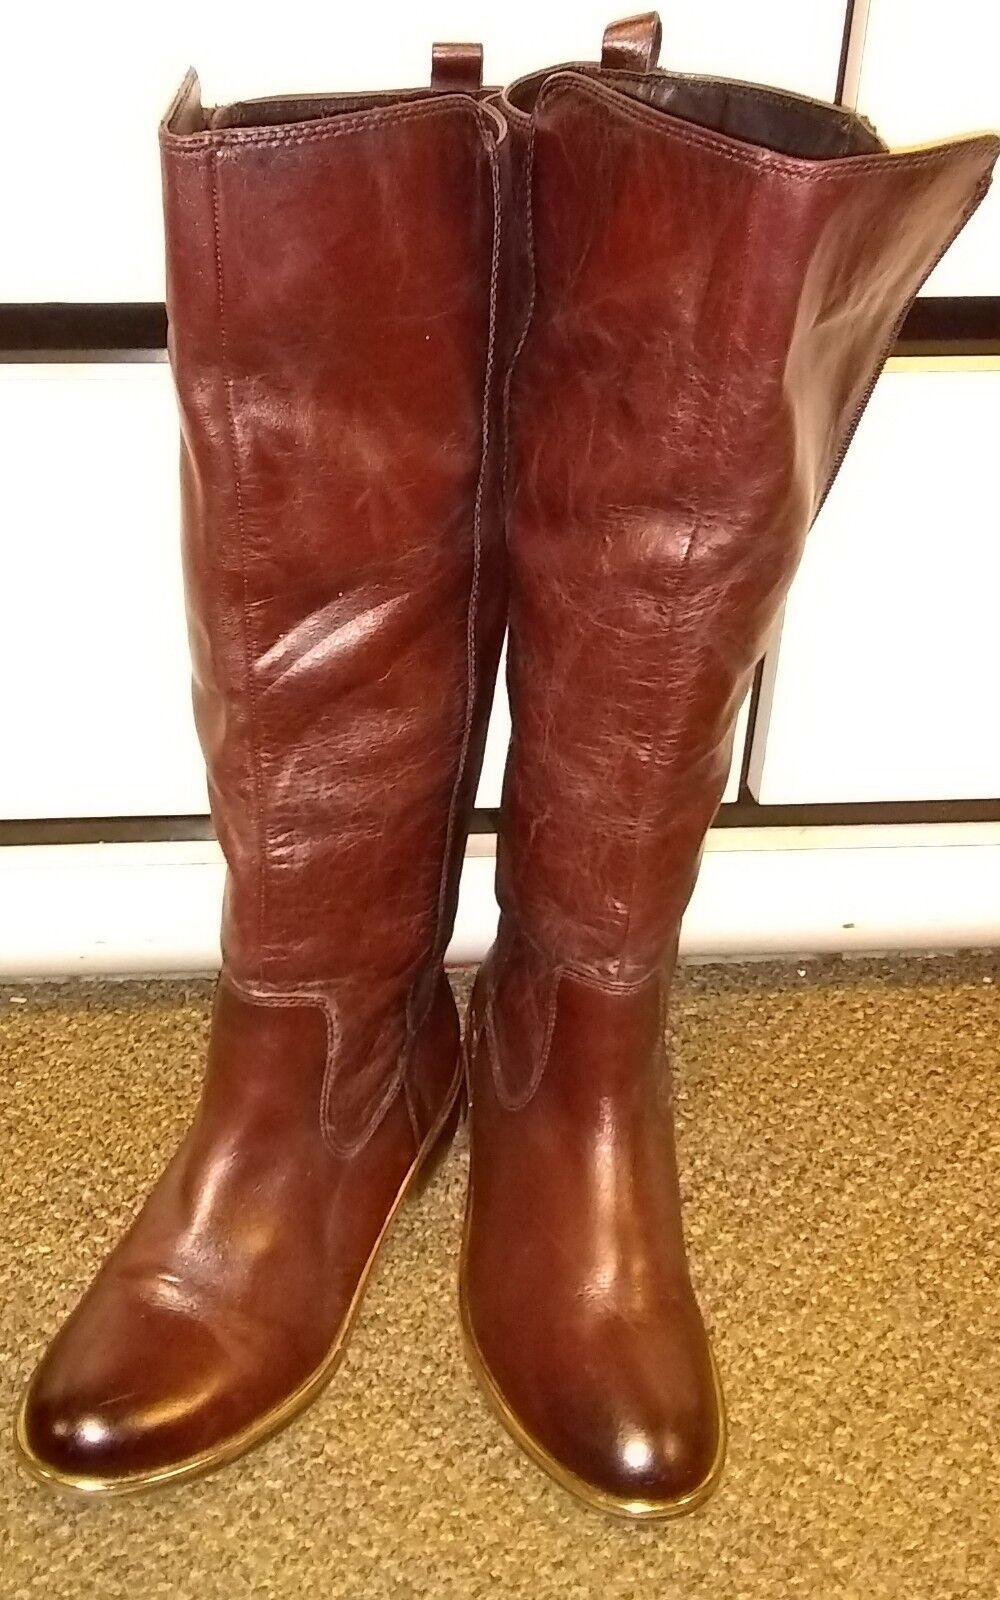 Aldo Cognac Cherrie 100% Leather Riding stivali